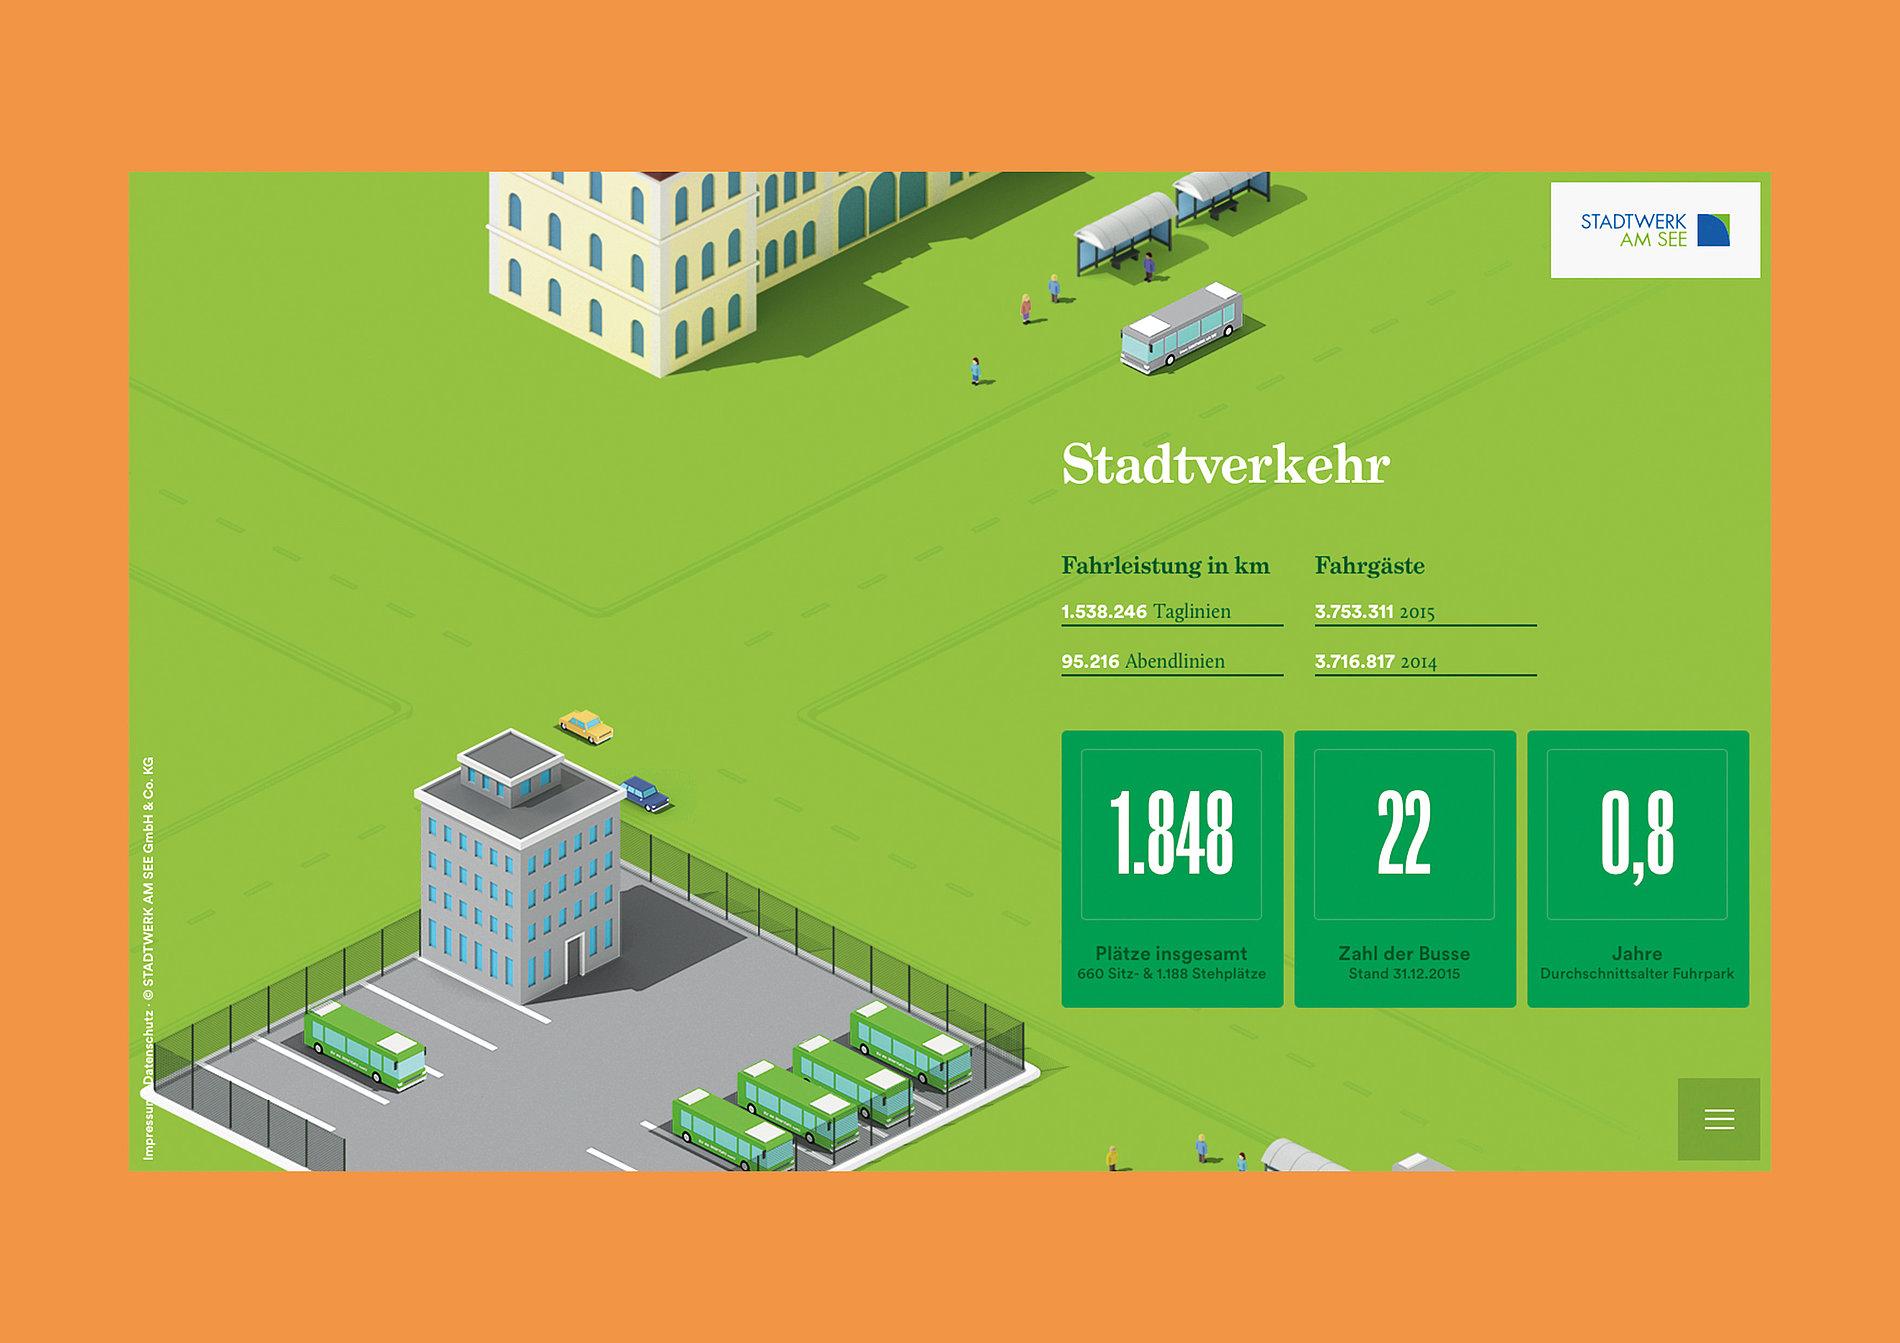 Stadtwerk am See Annual Report 2015   Red Dot Design Award